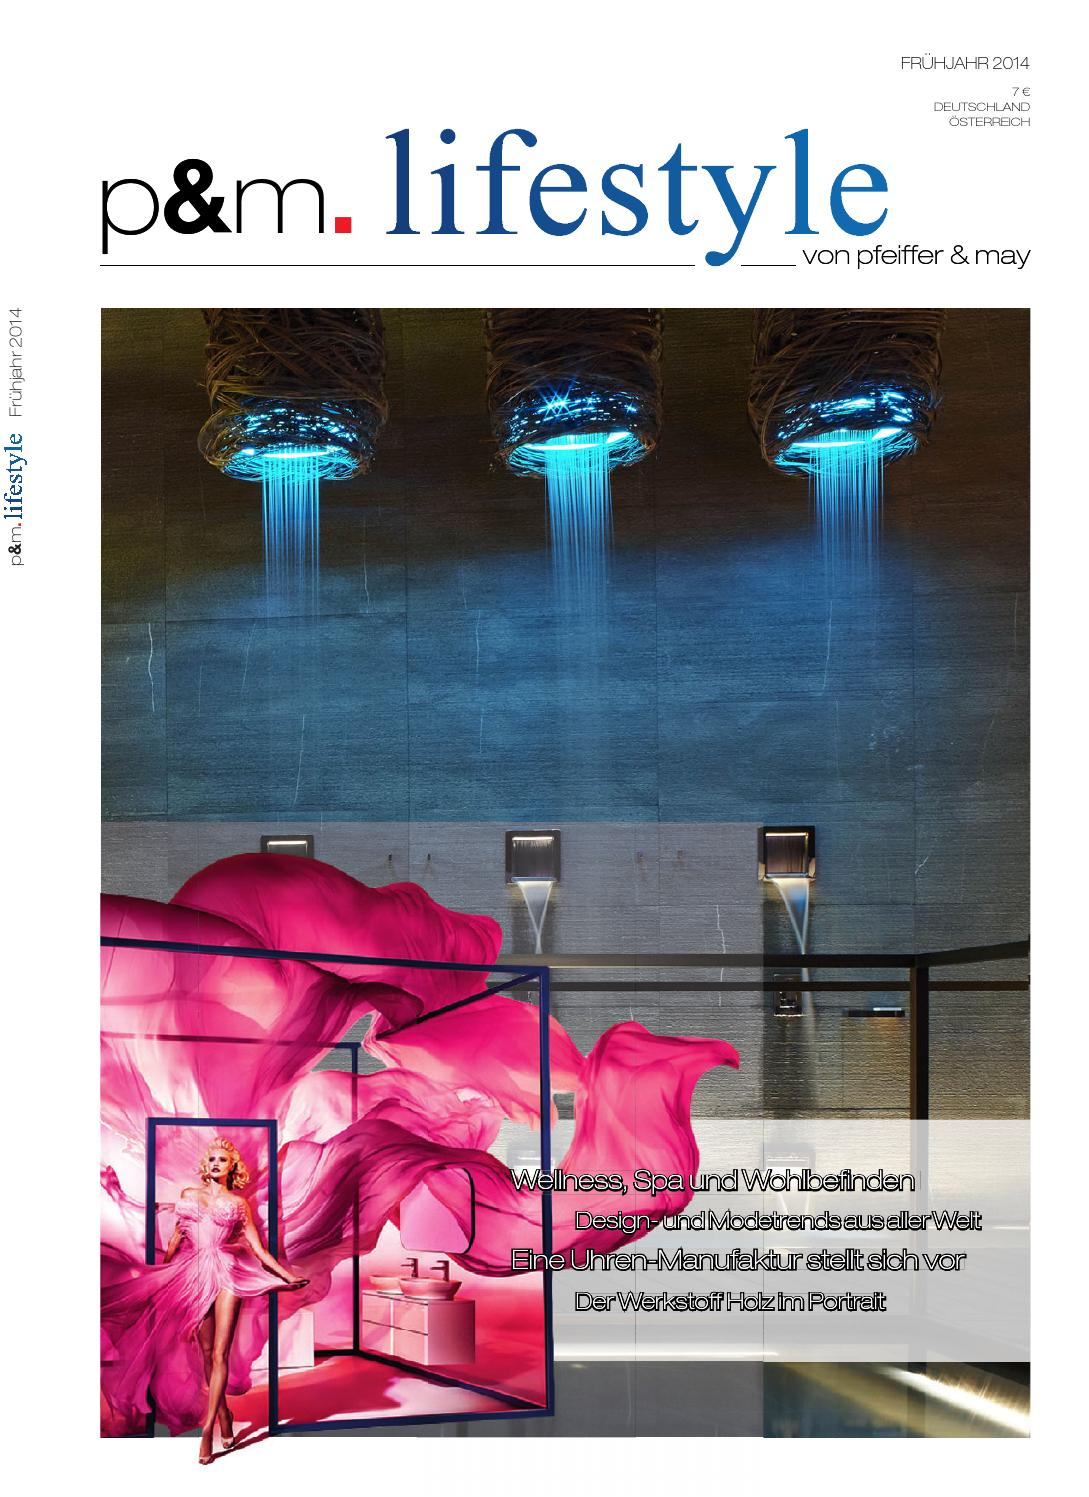 Pfeiffer & May Lifestyle Magazin by Meier Eier - issuu